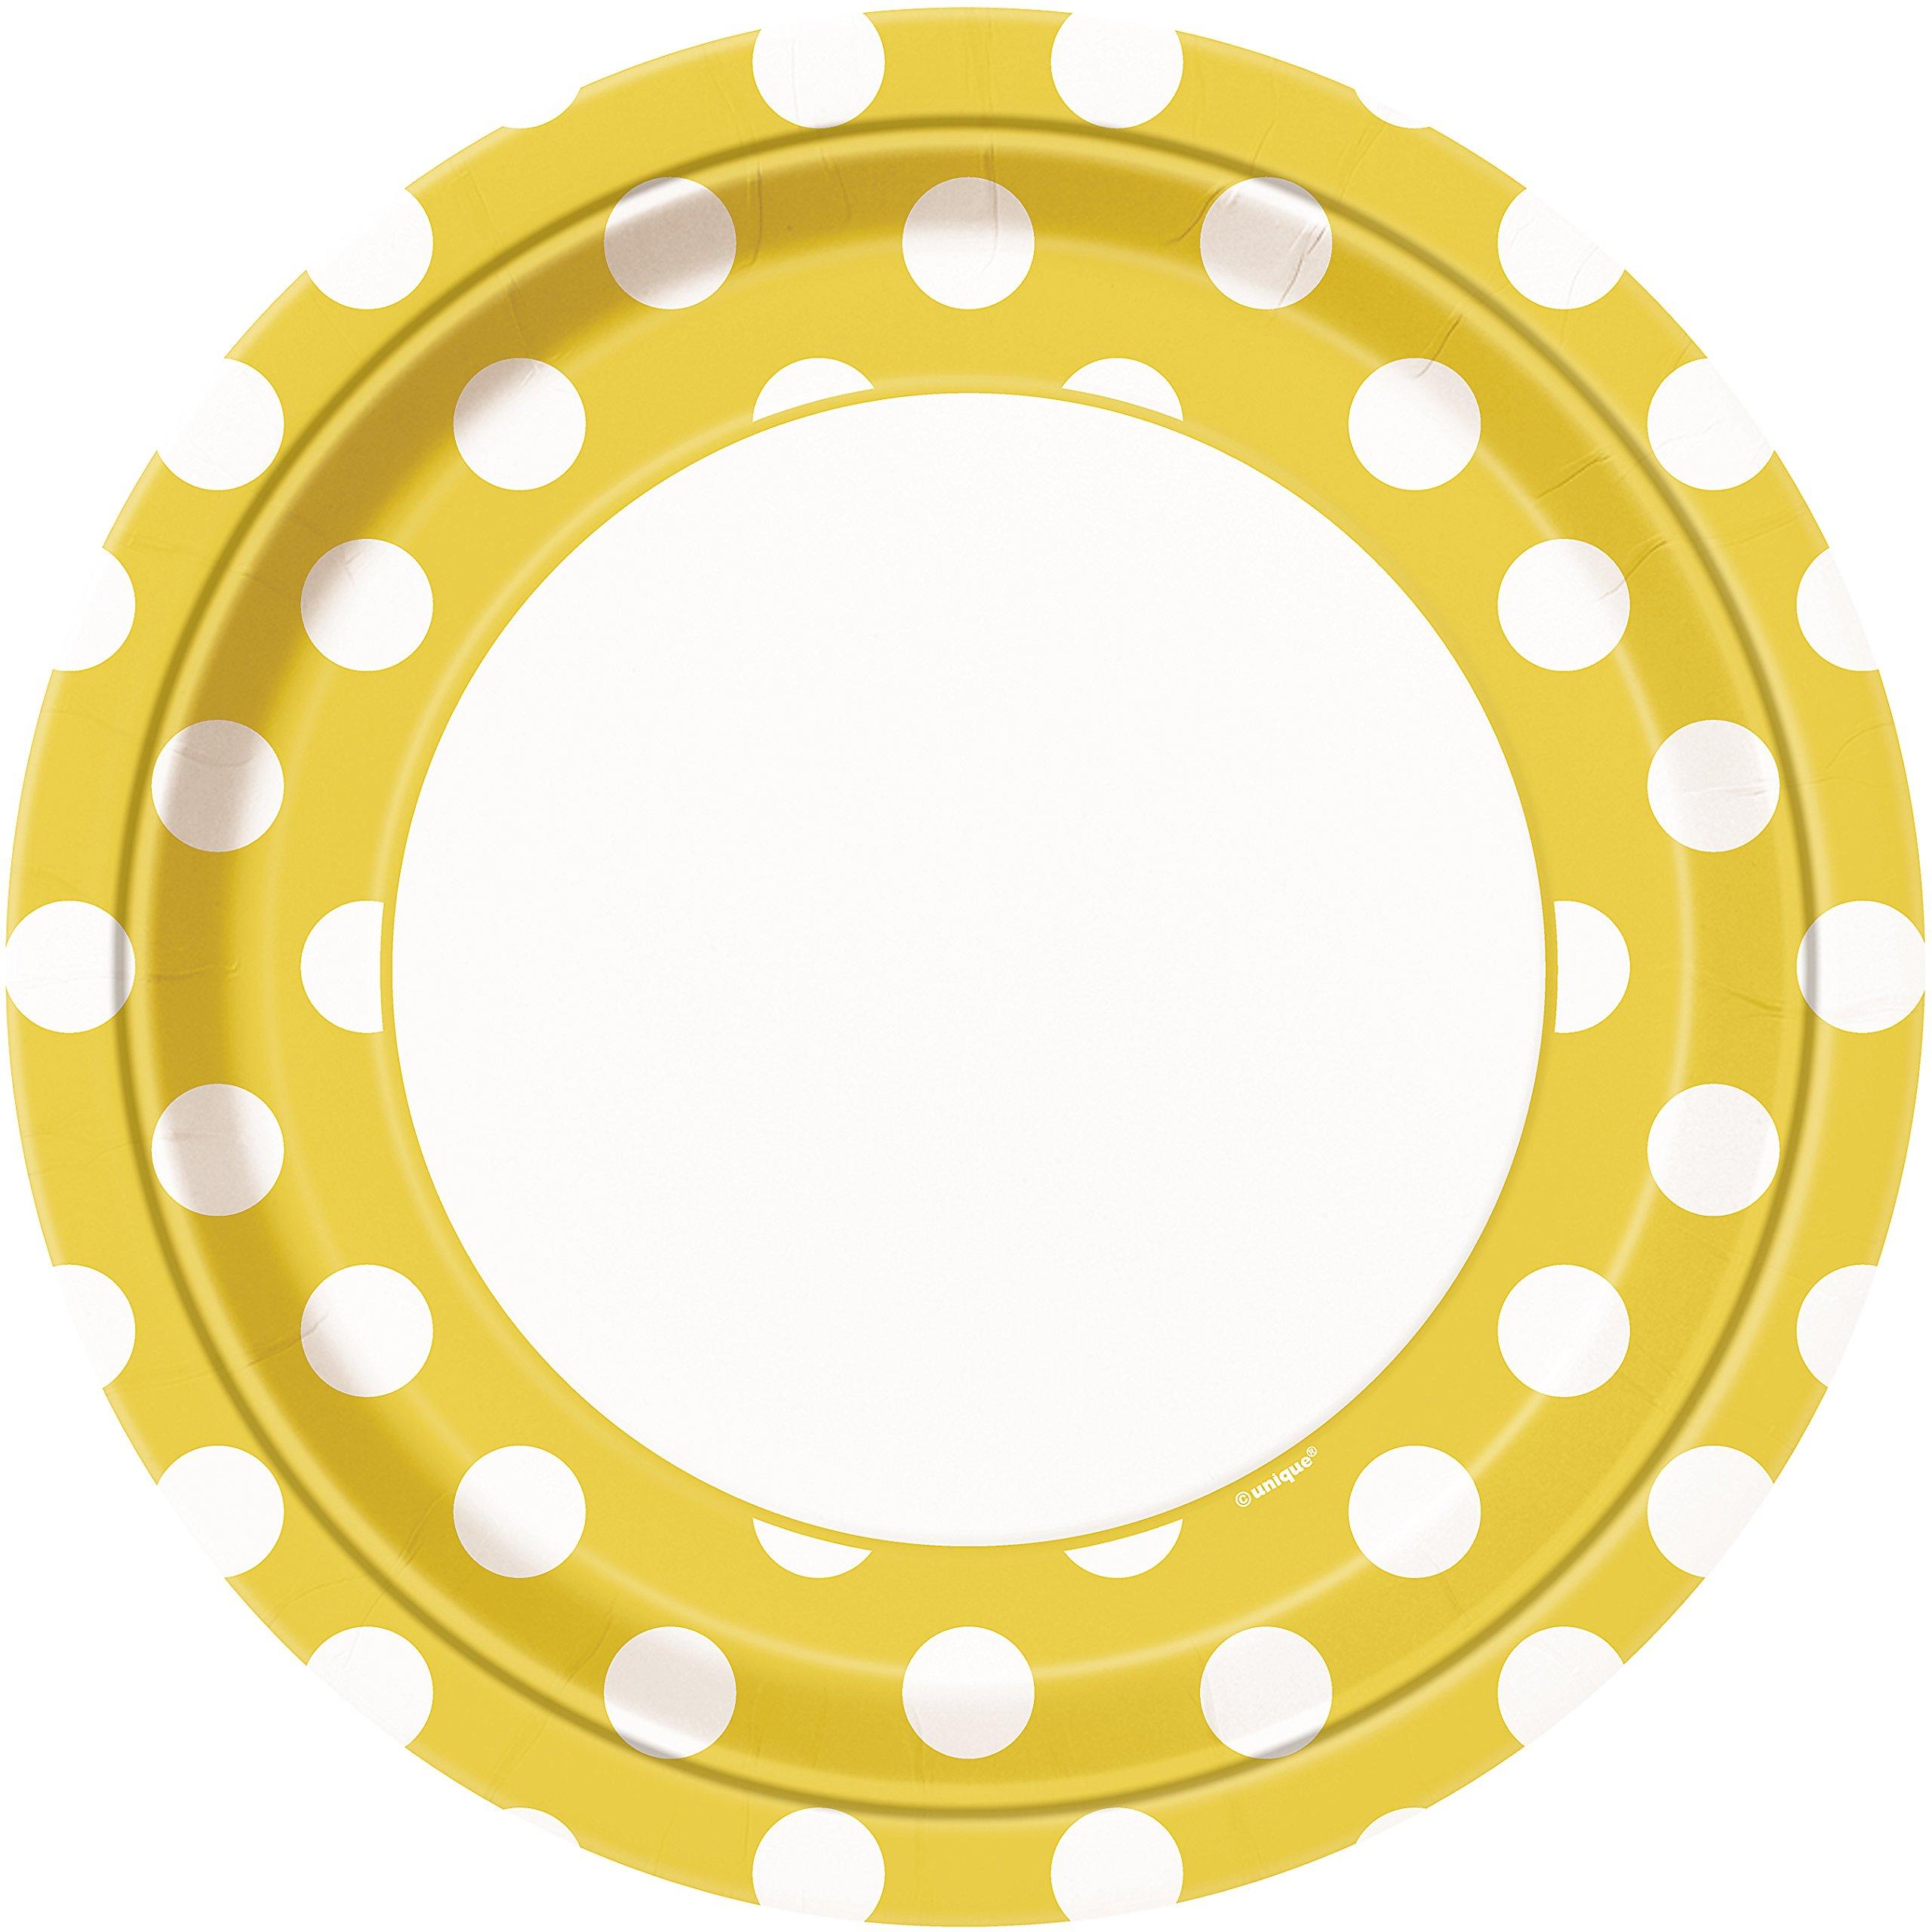 Unique Industries, Polka Dot Paper Plates, 8 Pieces - Yellow